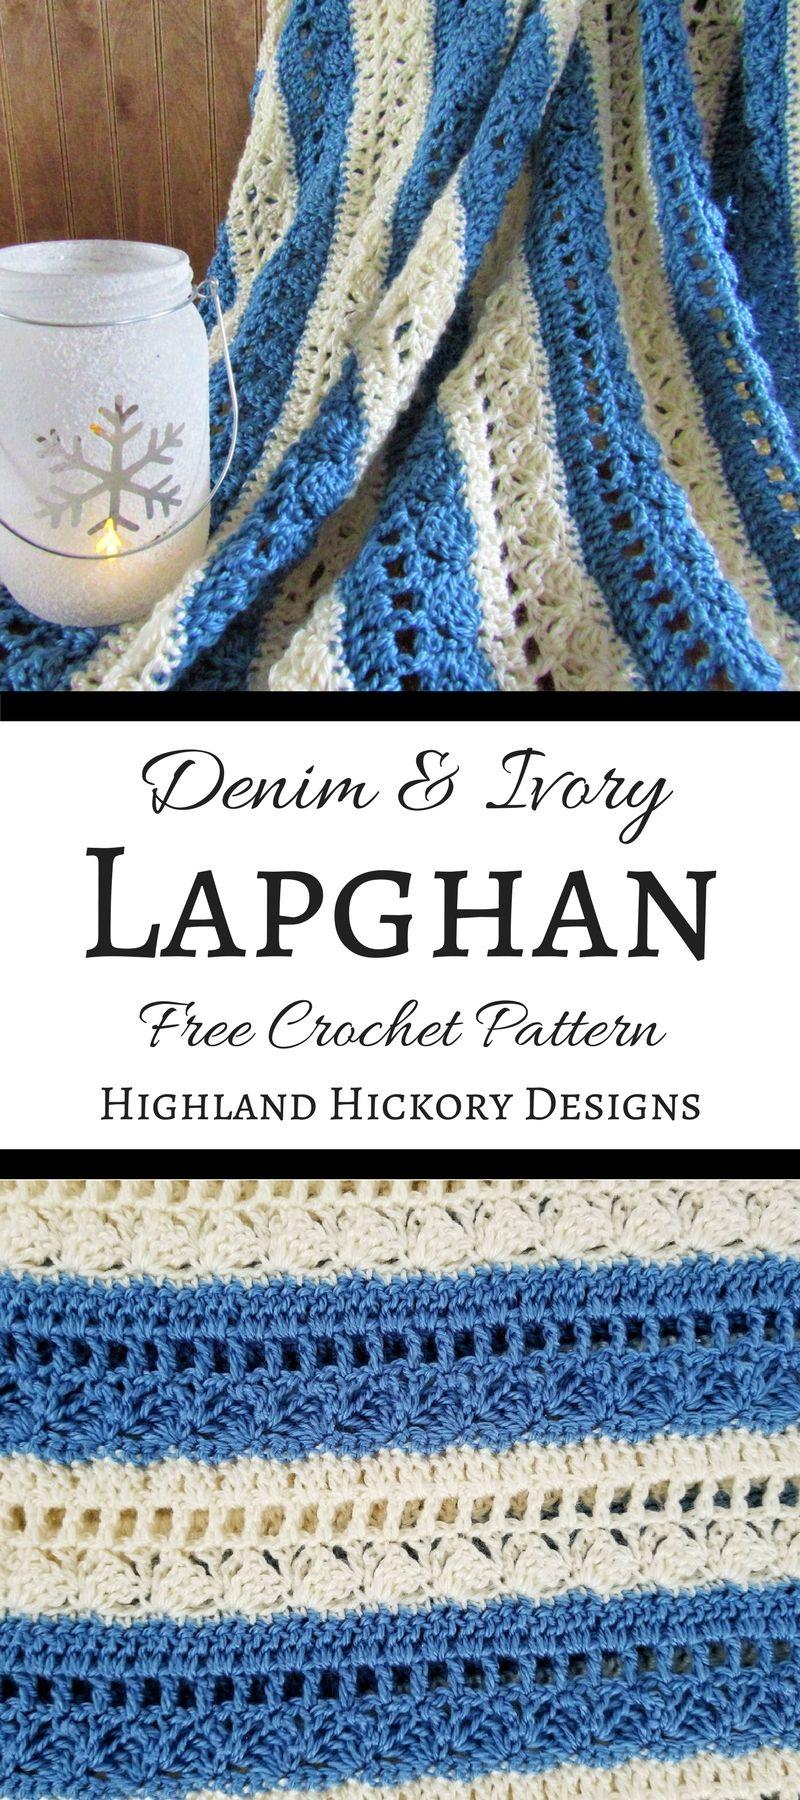 Denim & Ivory Lapghan | Crochet | Pinterest | Colchas, Puntadas y Manta